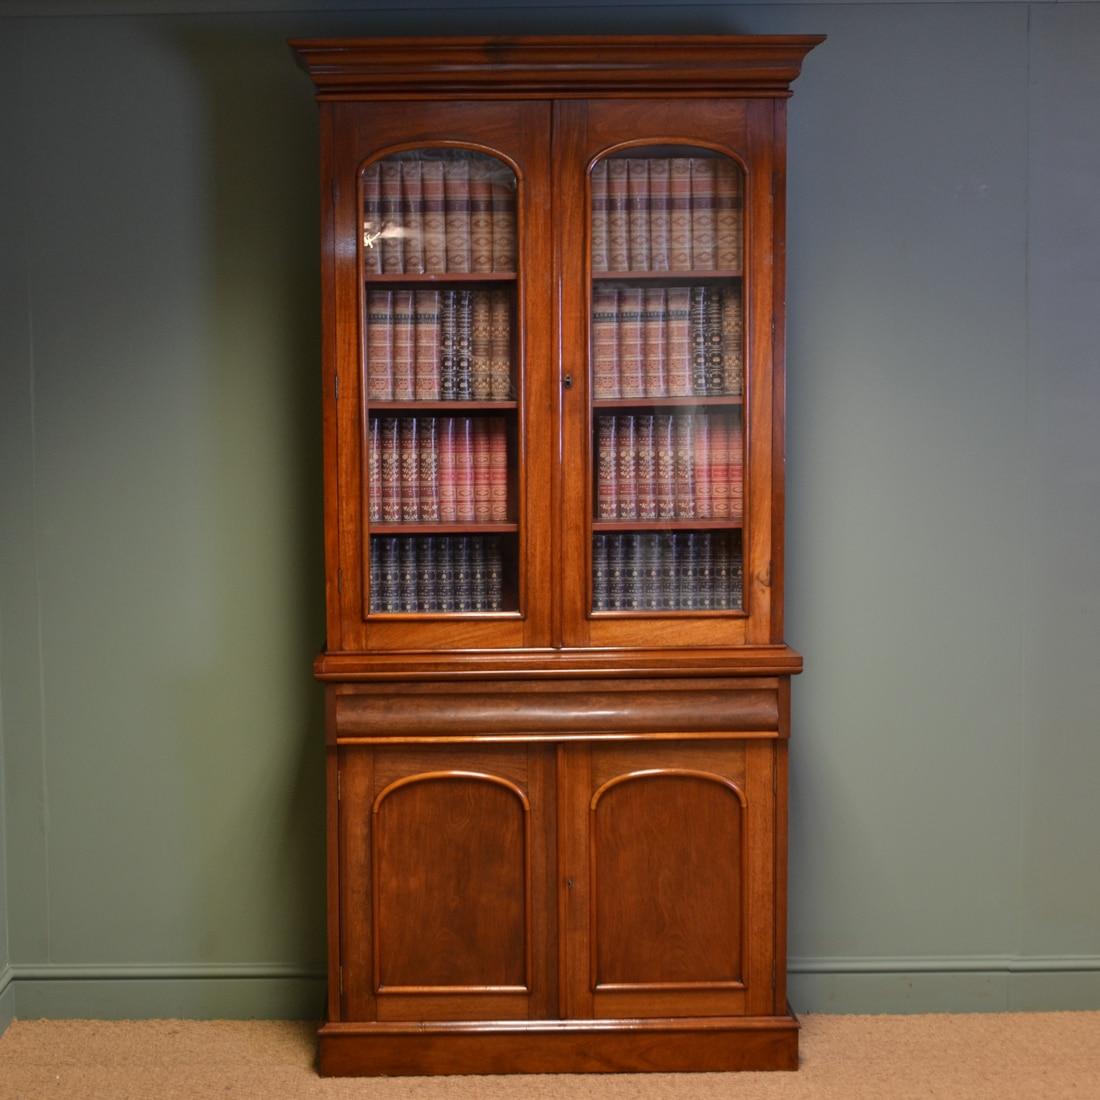 Antique Bookshelves: Beautiful Victorian Mahogany Antique Glazed Bookcase On